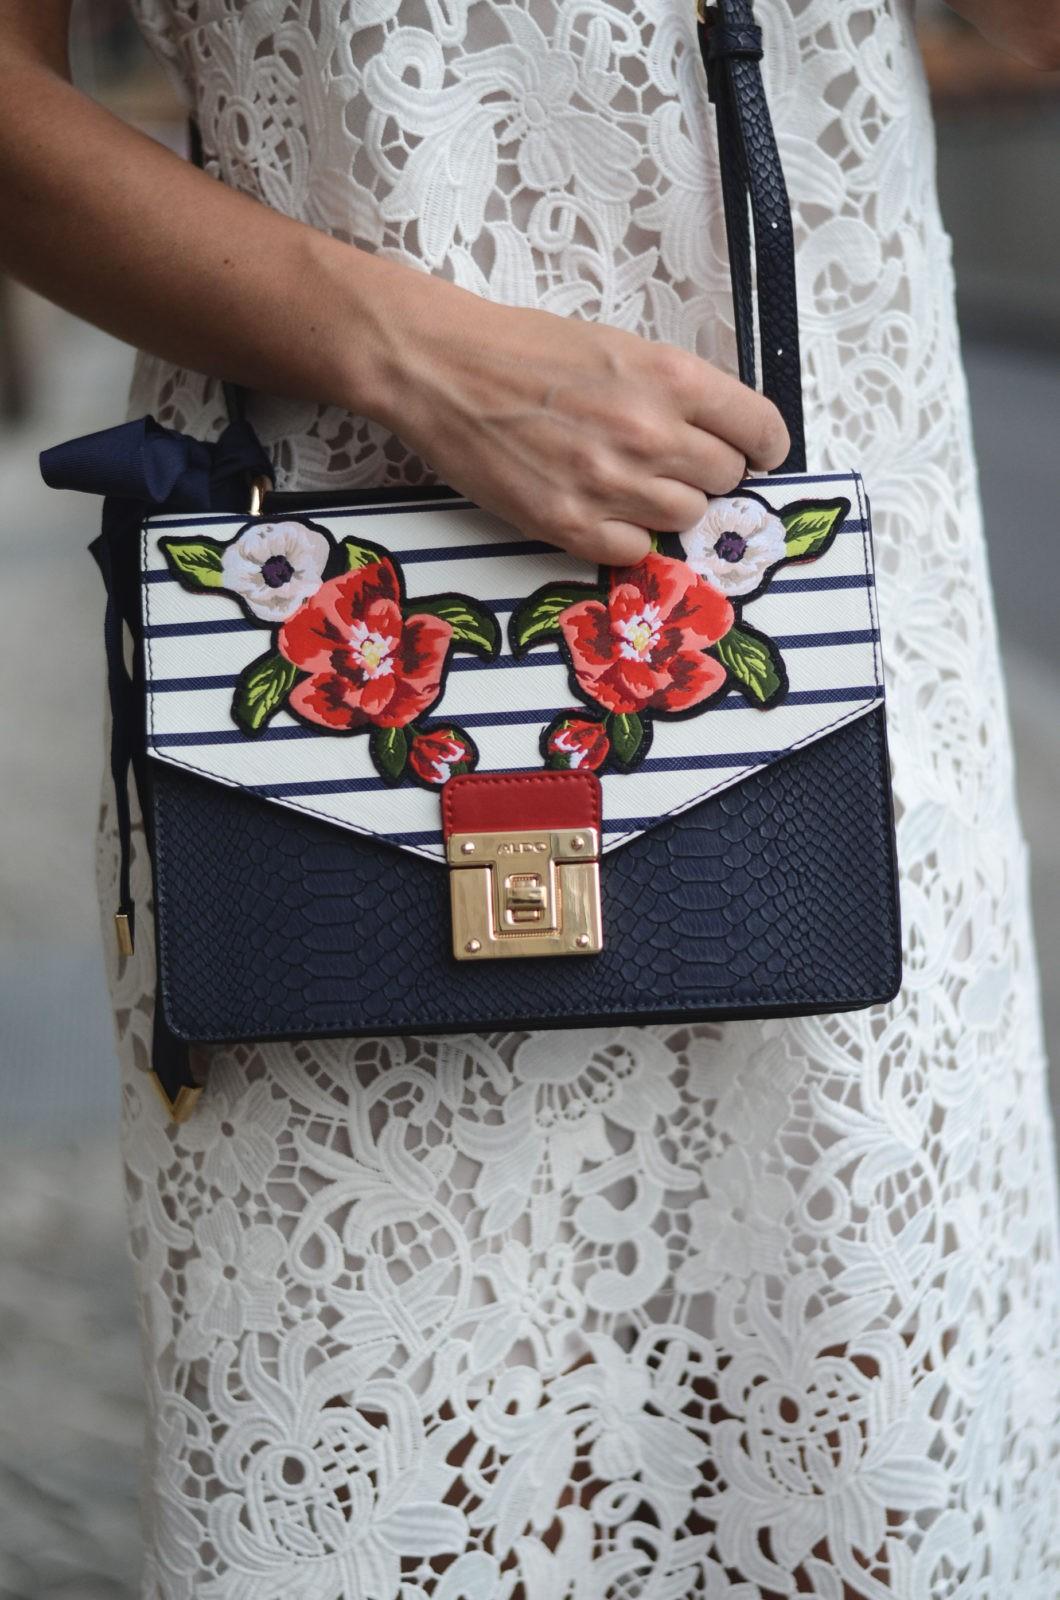 Sariety-modeblog-heidelberg-sarah-czok-fashionblogger-zara-spitzenkleid-superga-aldo-bag-14